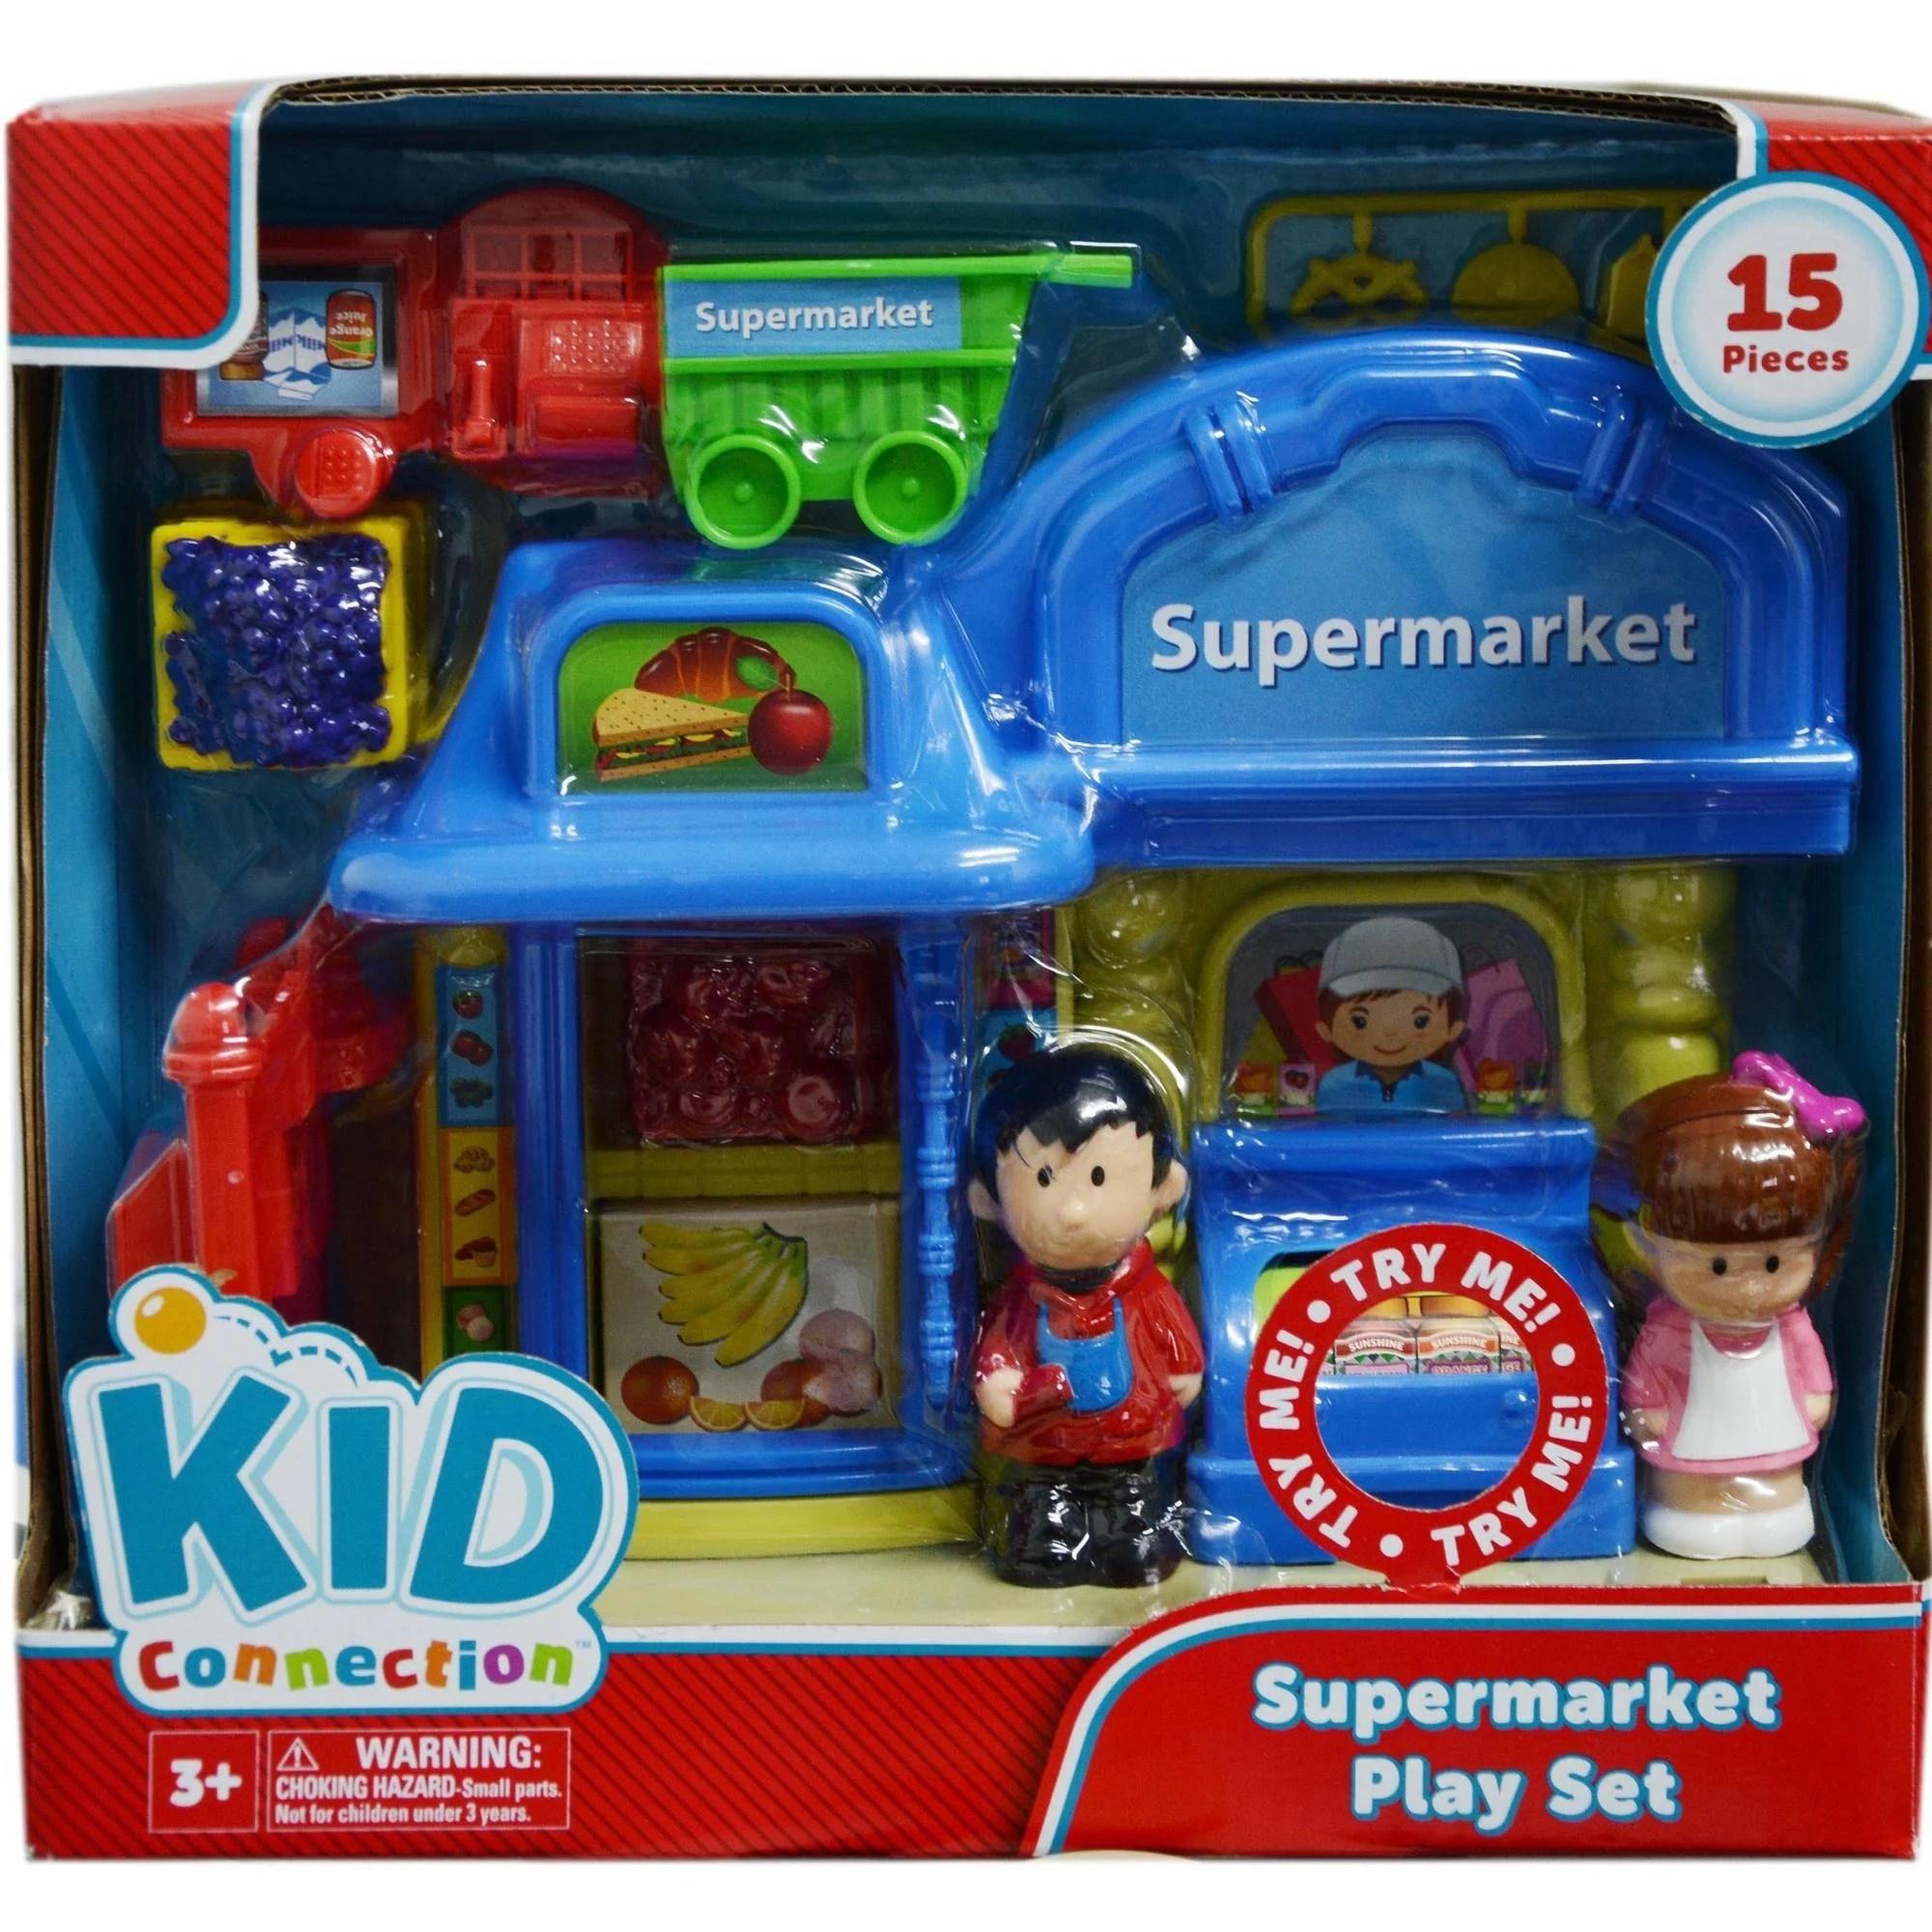 Kid Connection Supermarket Play Set Walmart